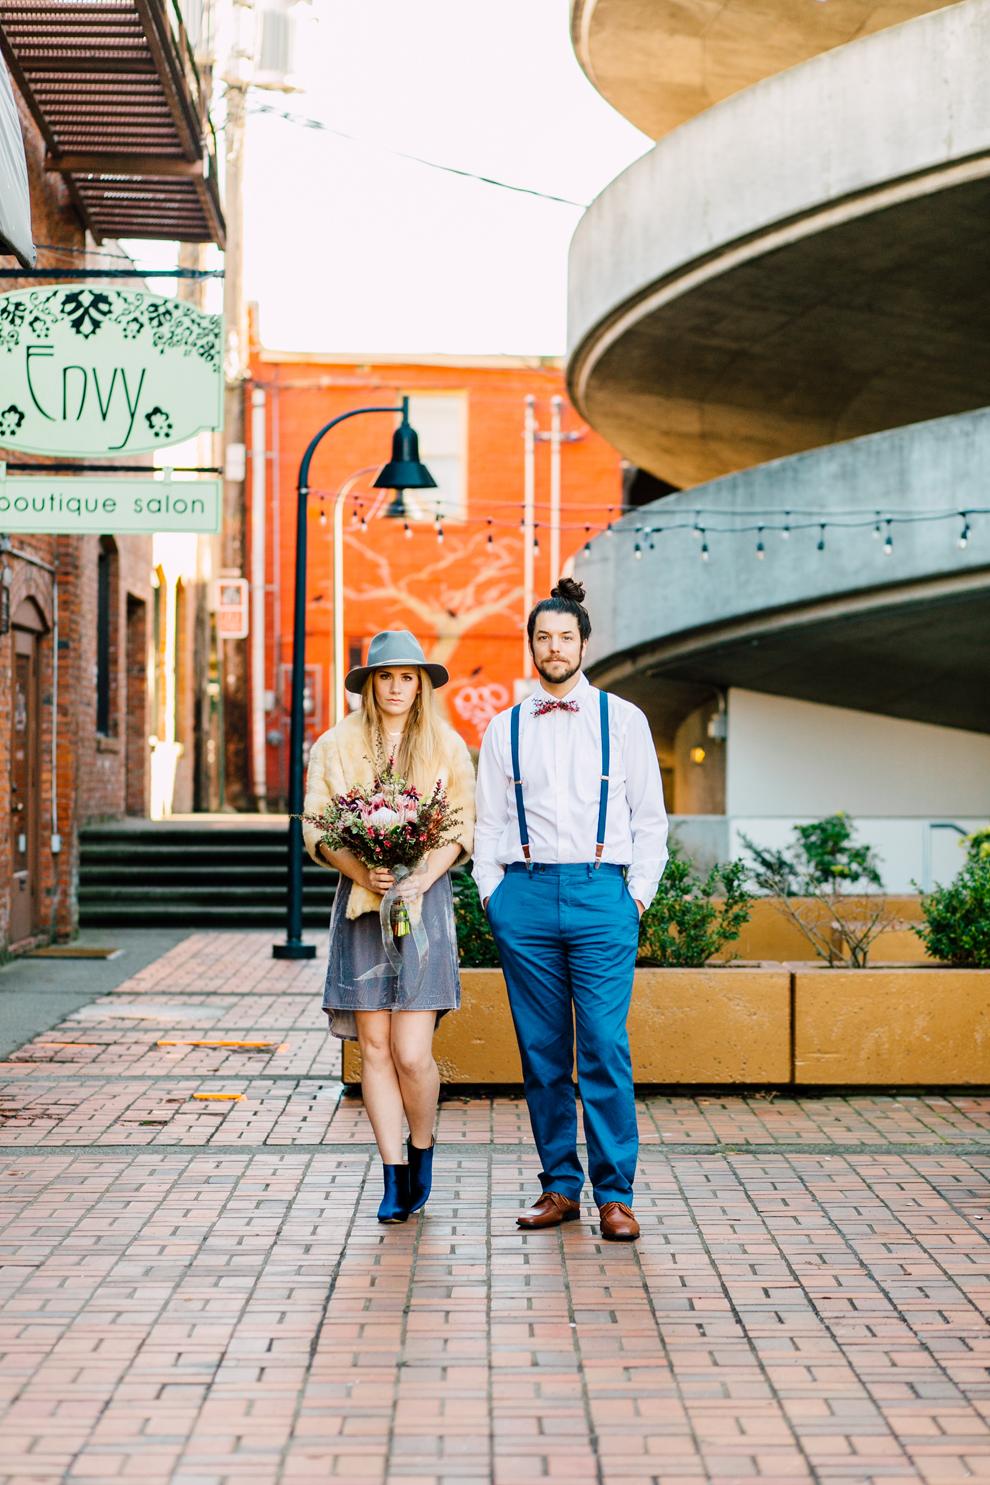 001-bellingham-parkade-elopement-styled-katheryn-moran-photography.jpg